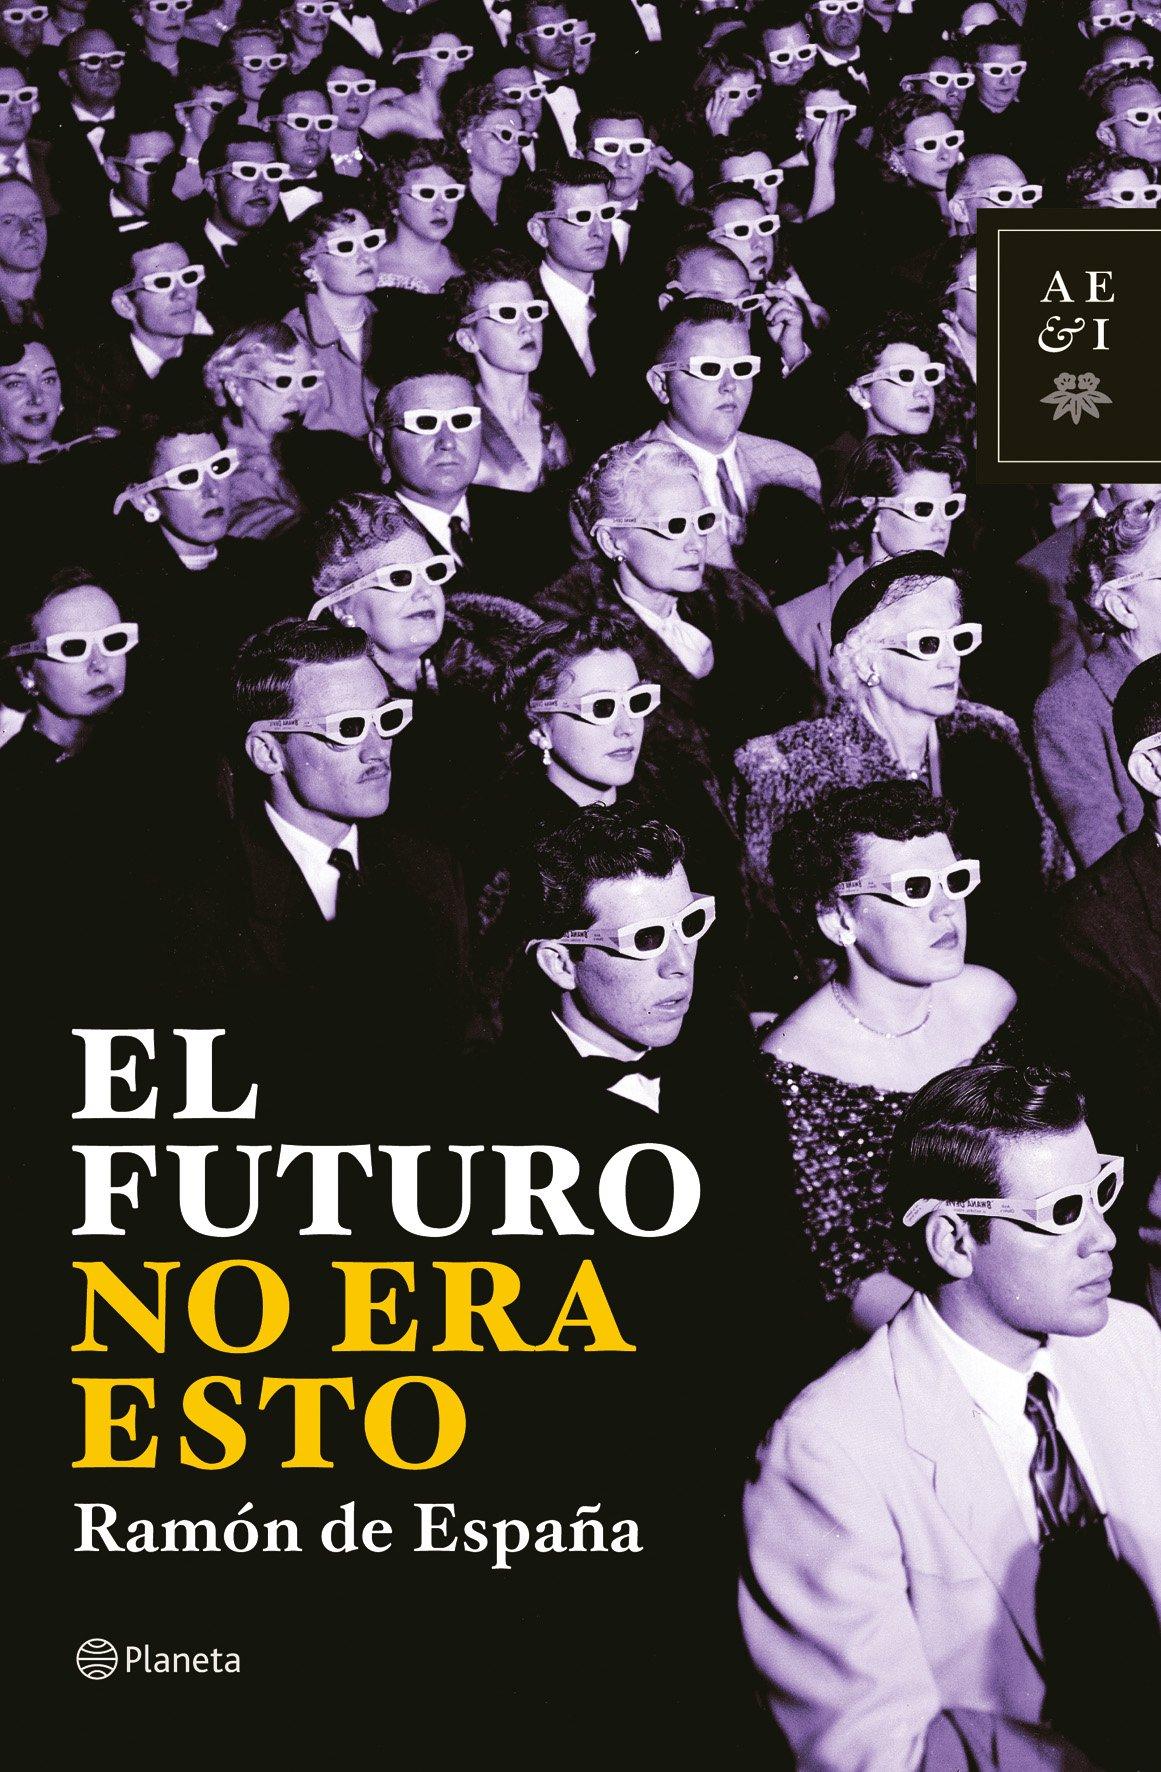 El futuro no era esto Autores Españoles e Iberoamericanos: Amazon.es: España, Ramón de: Libros